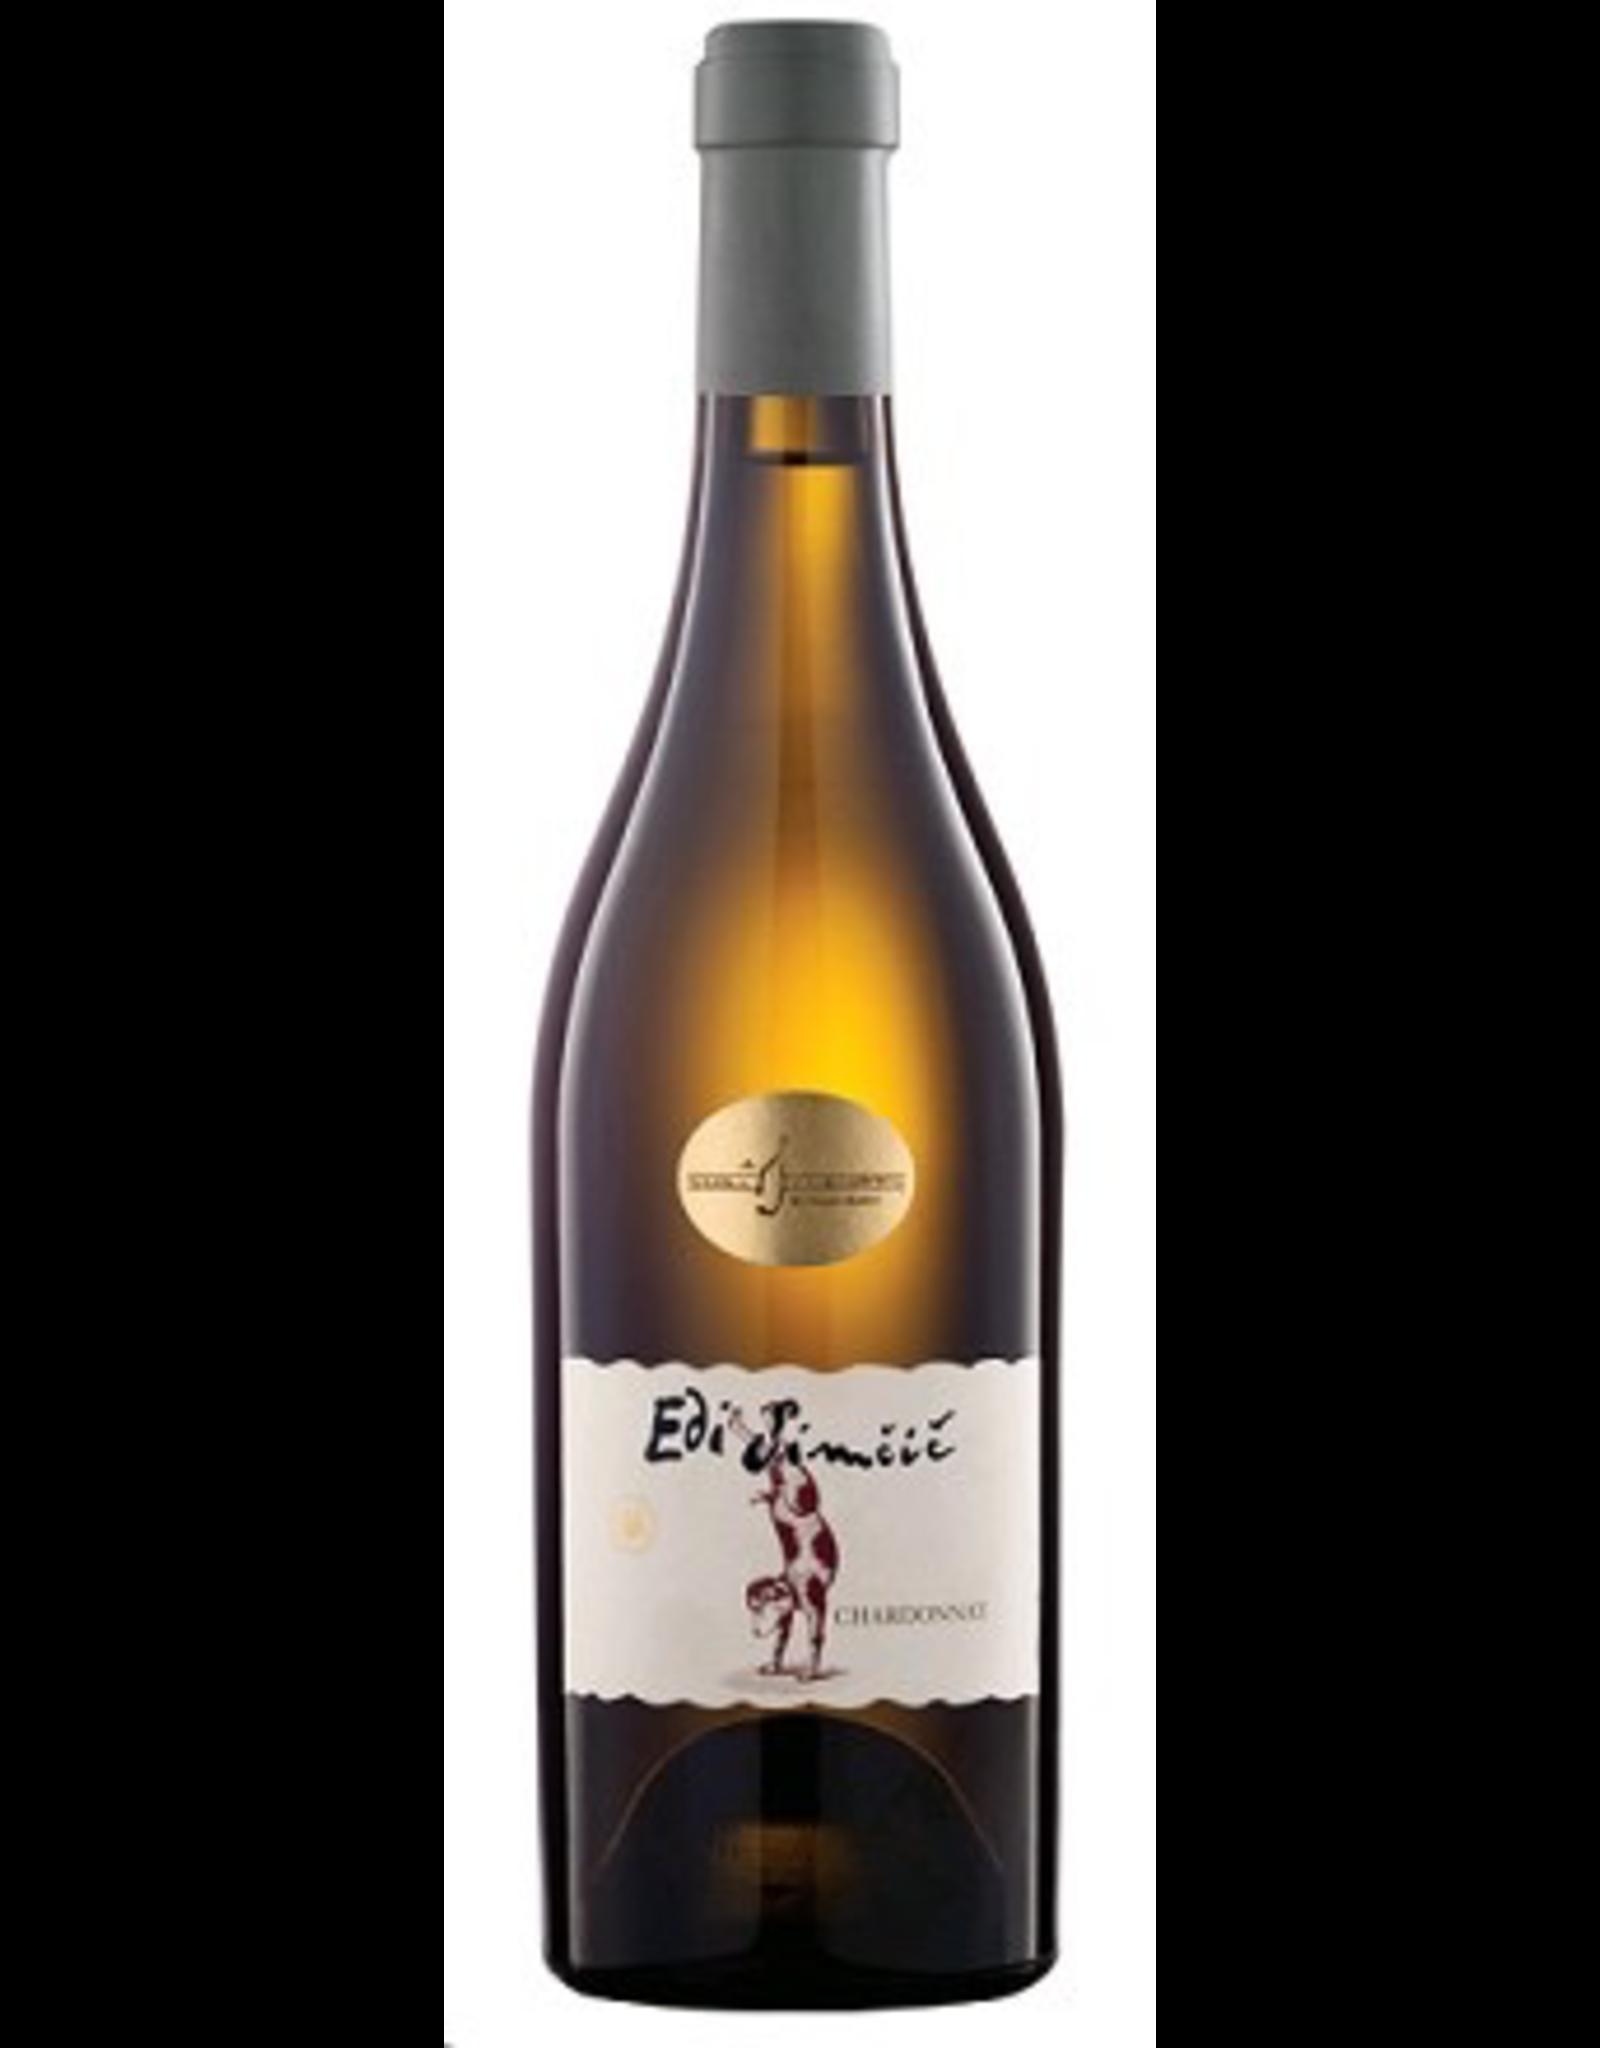 White Wine 2014, Edi Simcic, Chardonnay, Goriska Brda, Slovenia, 13% Alc, CTnr, TW92